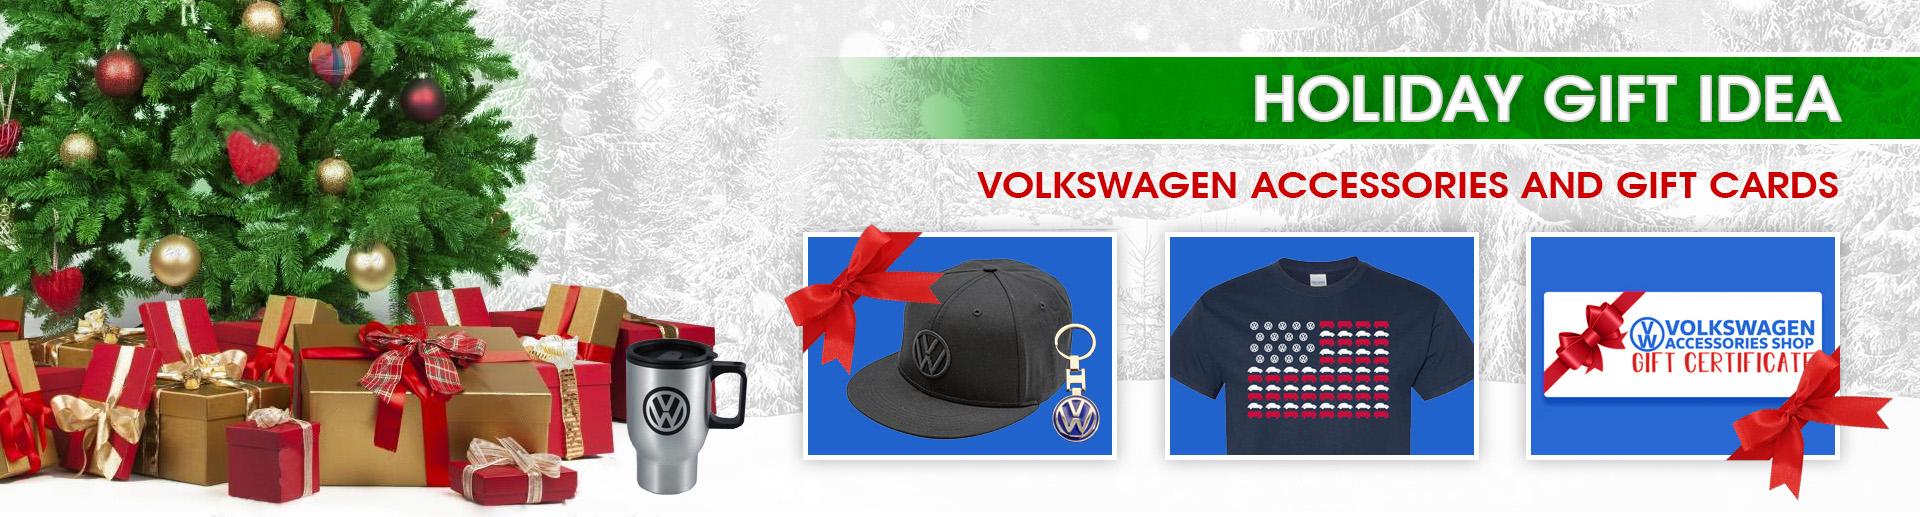 VW Gift Guide